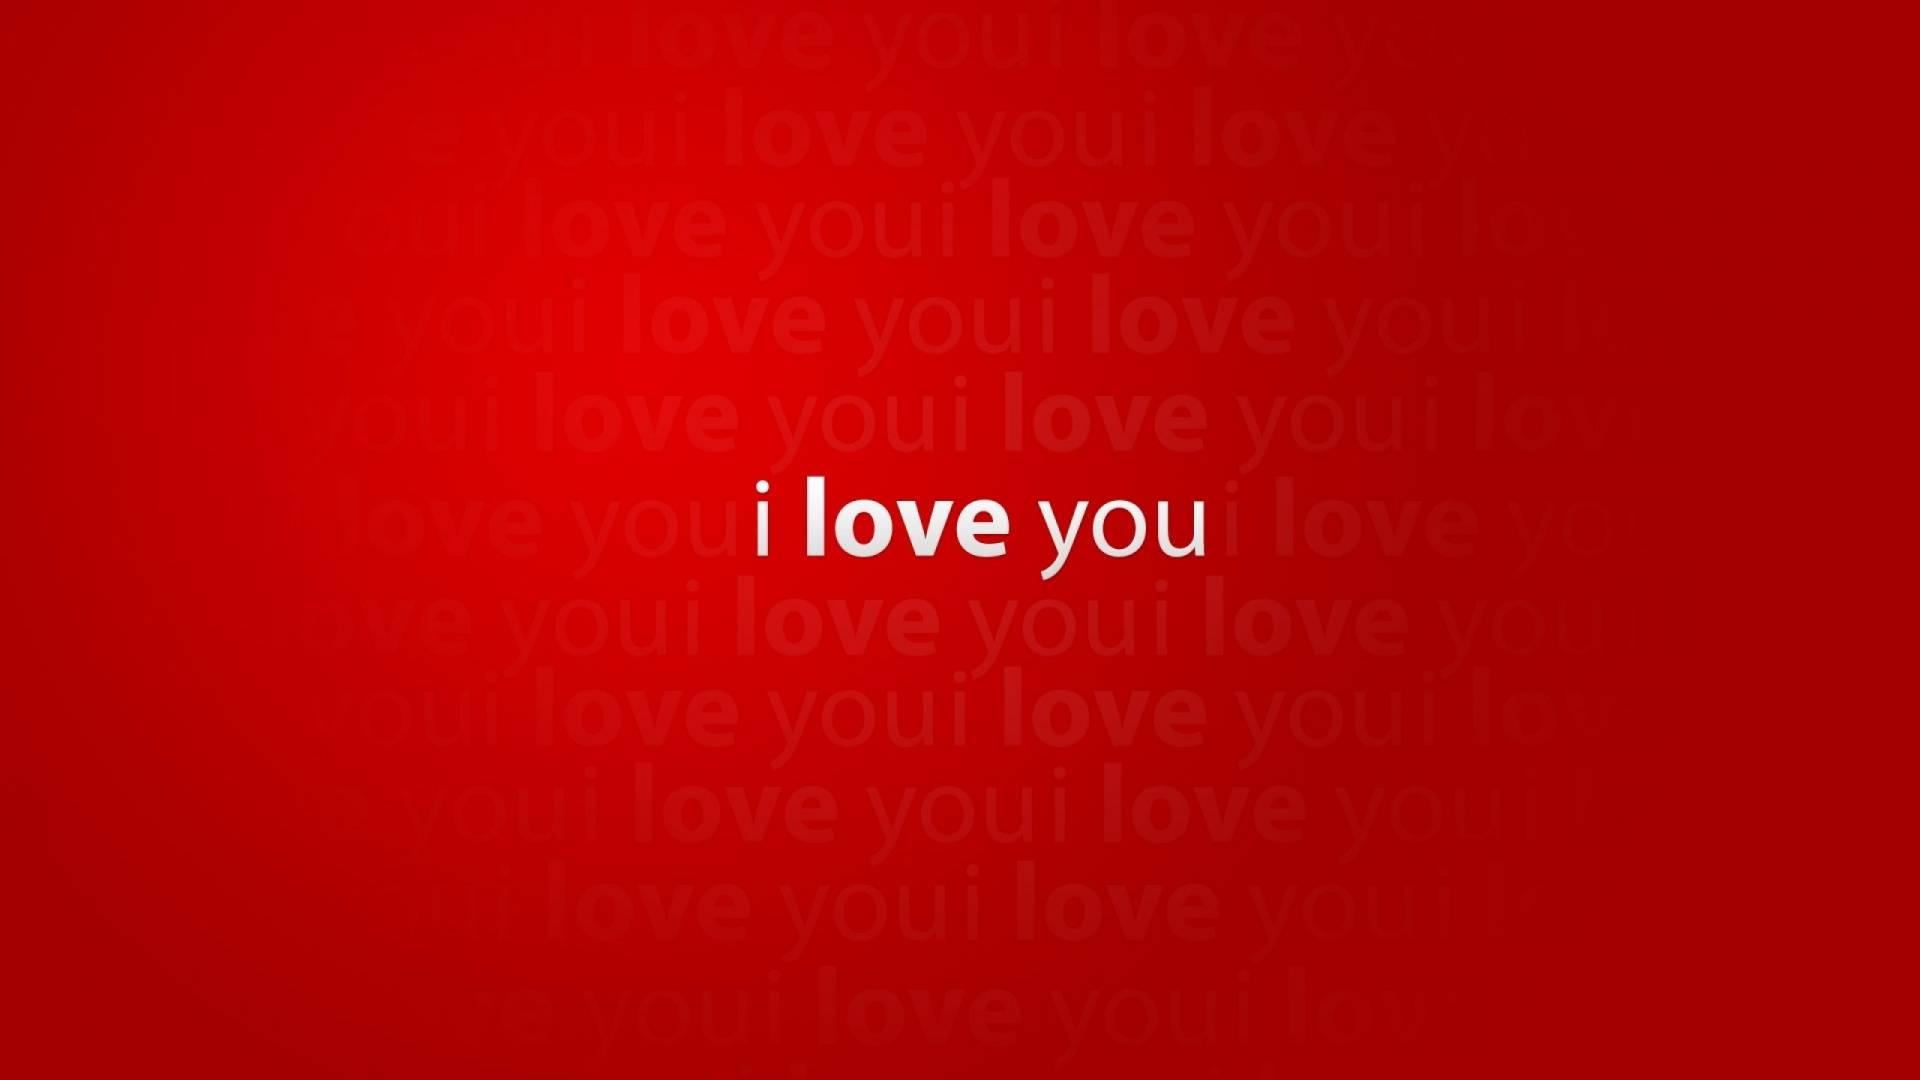 обои i love you, надпись, красный, фон картинки фото